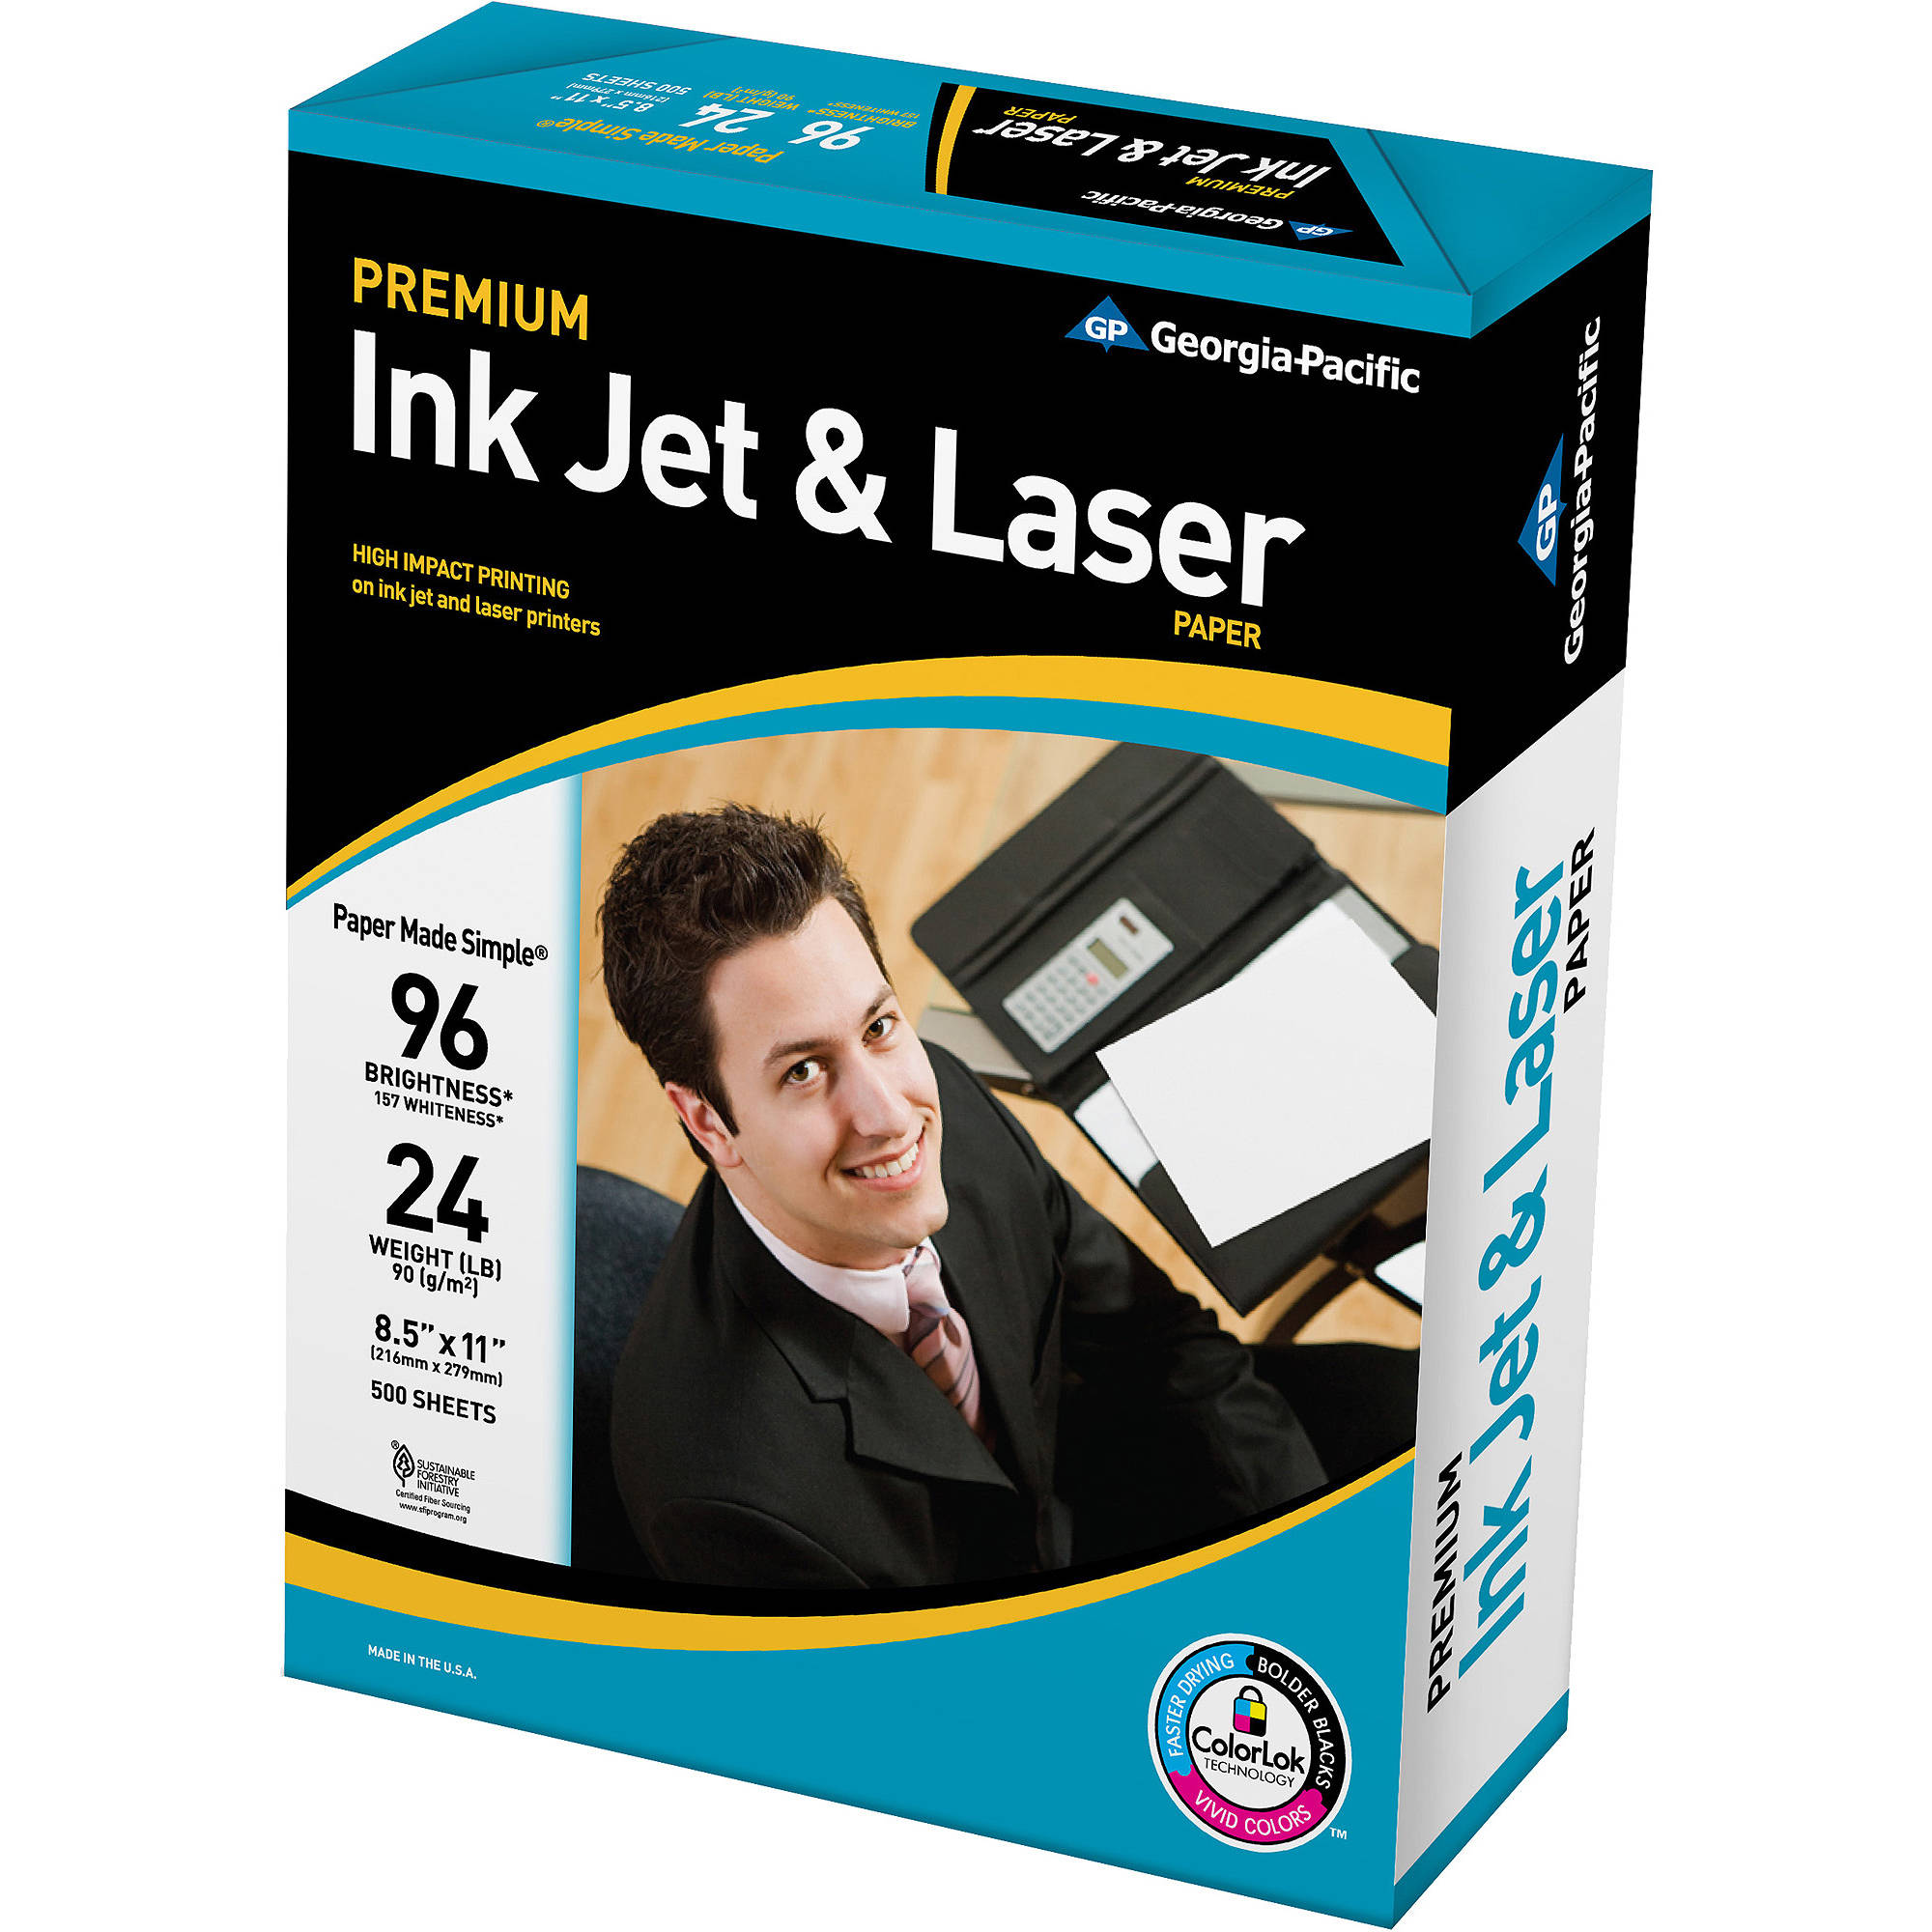 Georgia-Pacific Premium Bright Inkjet & Laser Paper, 8.5 x 11, 24 lb., 96 Brightness, 500 Sheets